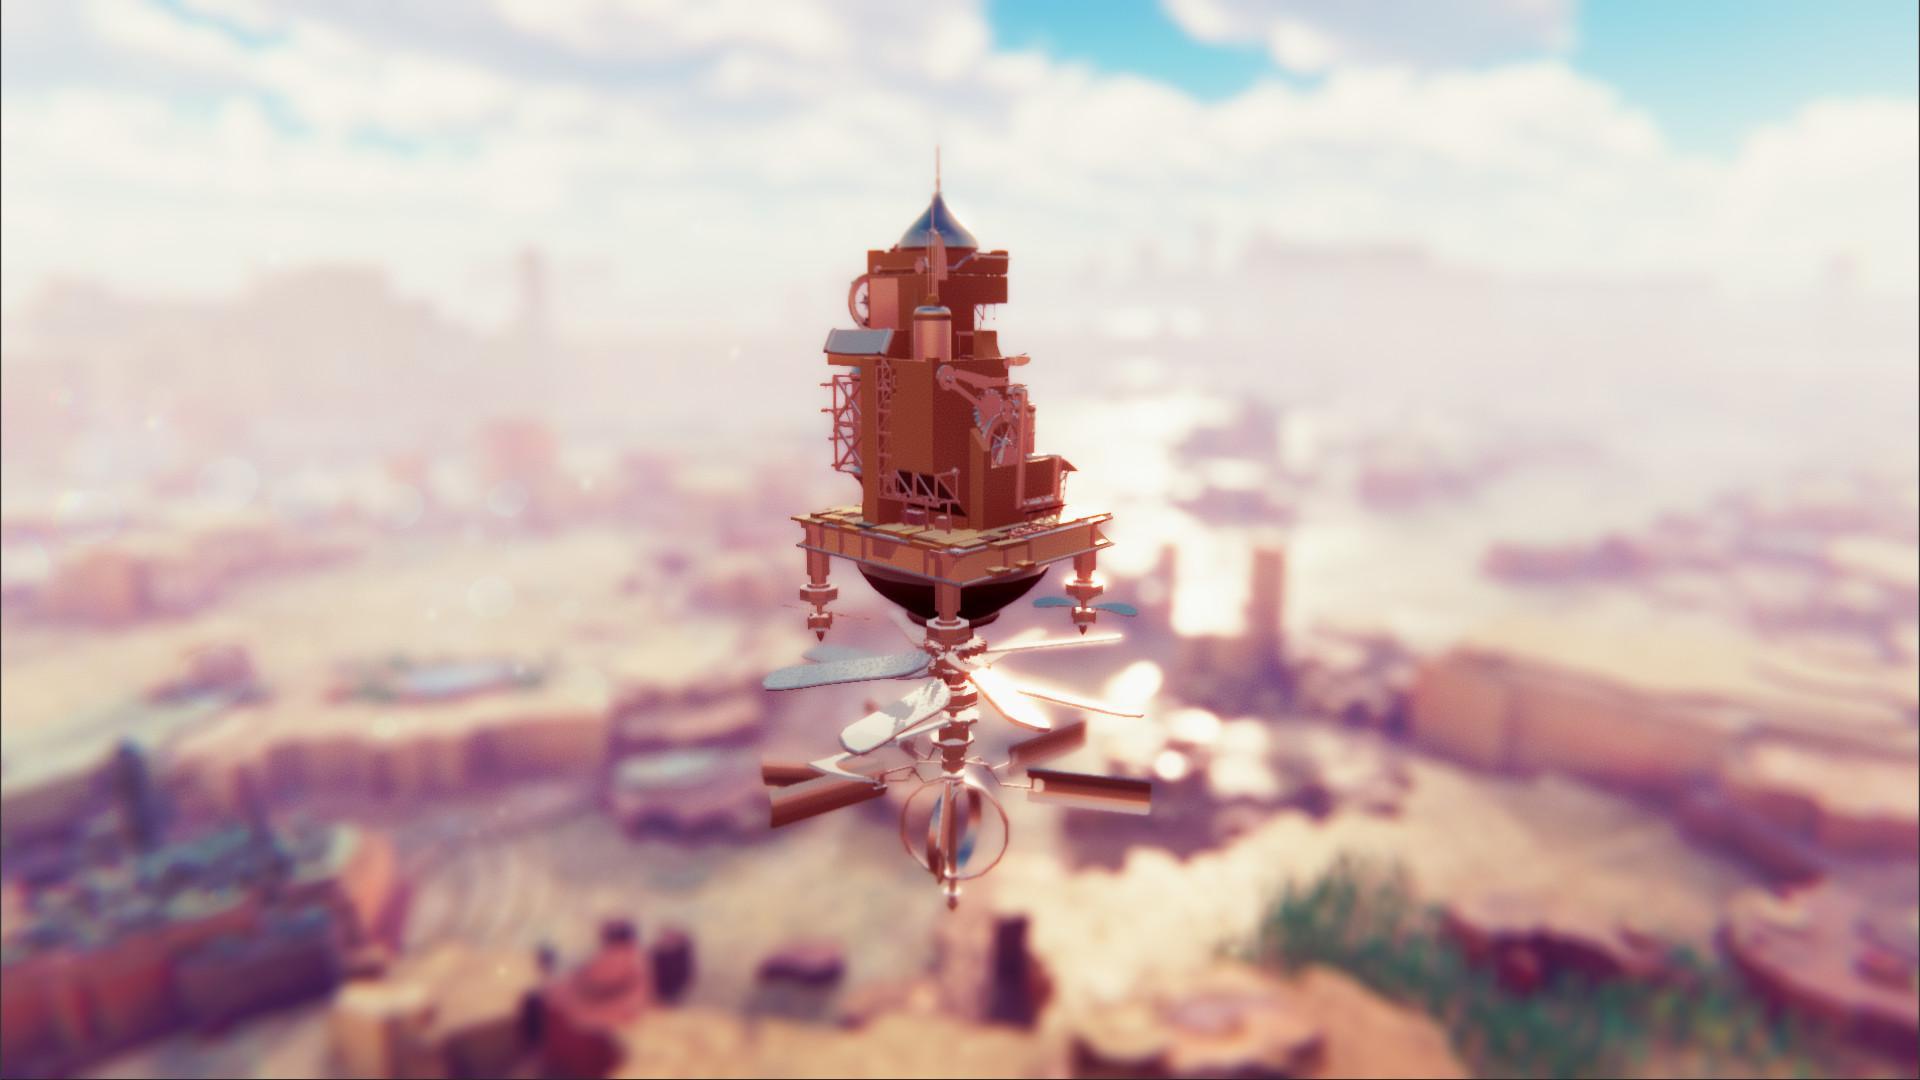 Airborne Kingdom 3082021 3